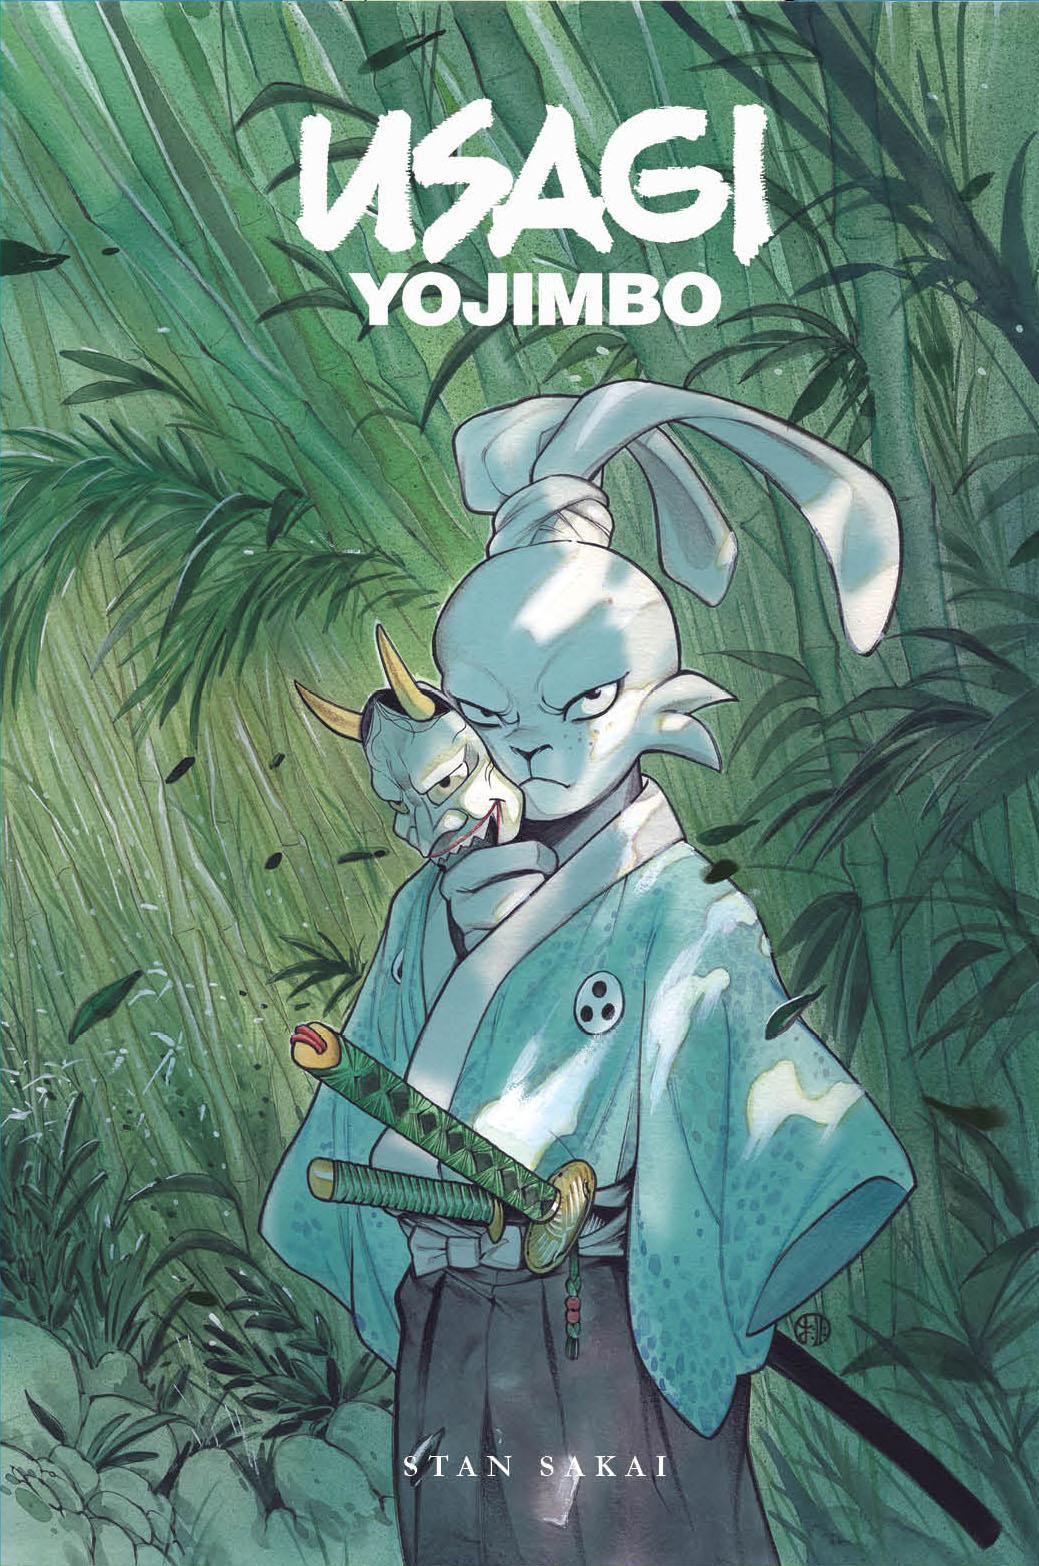 Usagi Yojimbo Cilt 2 (8-14. Sayılar Birarada) SERT KAPAK